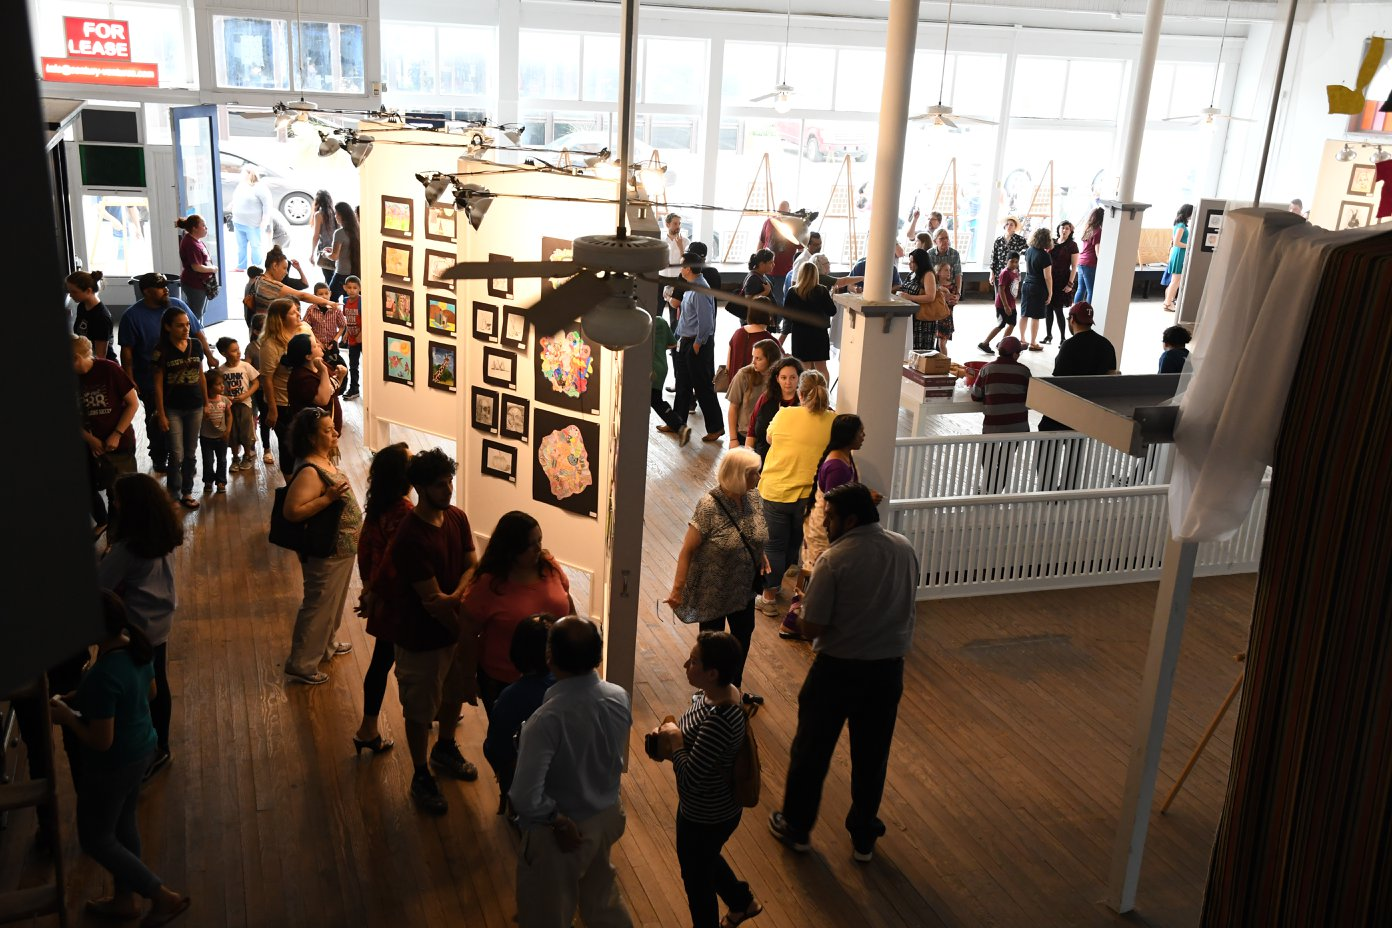 LISD art show at Masur Gallery